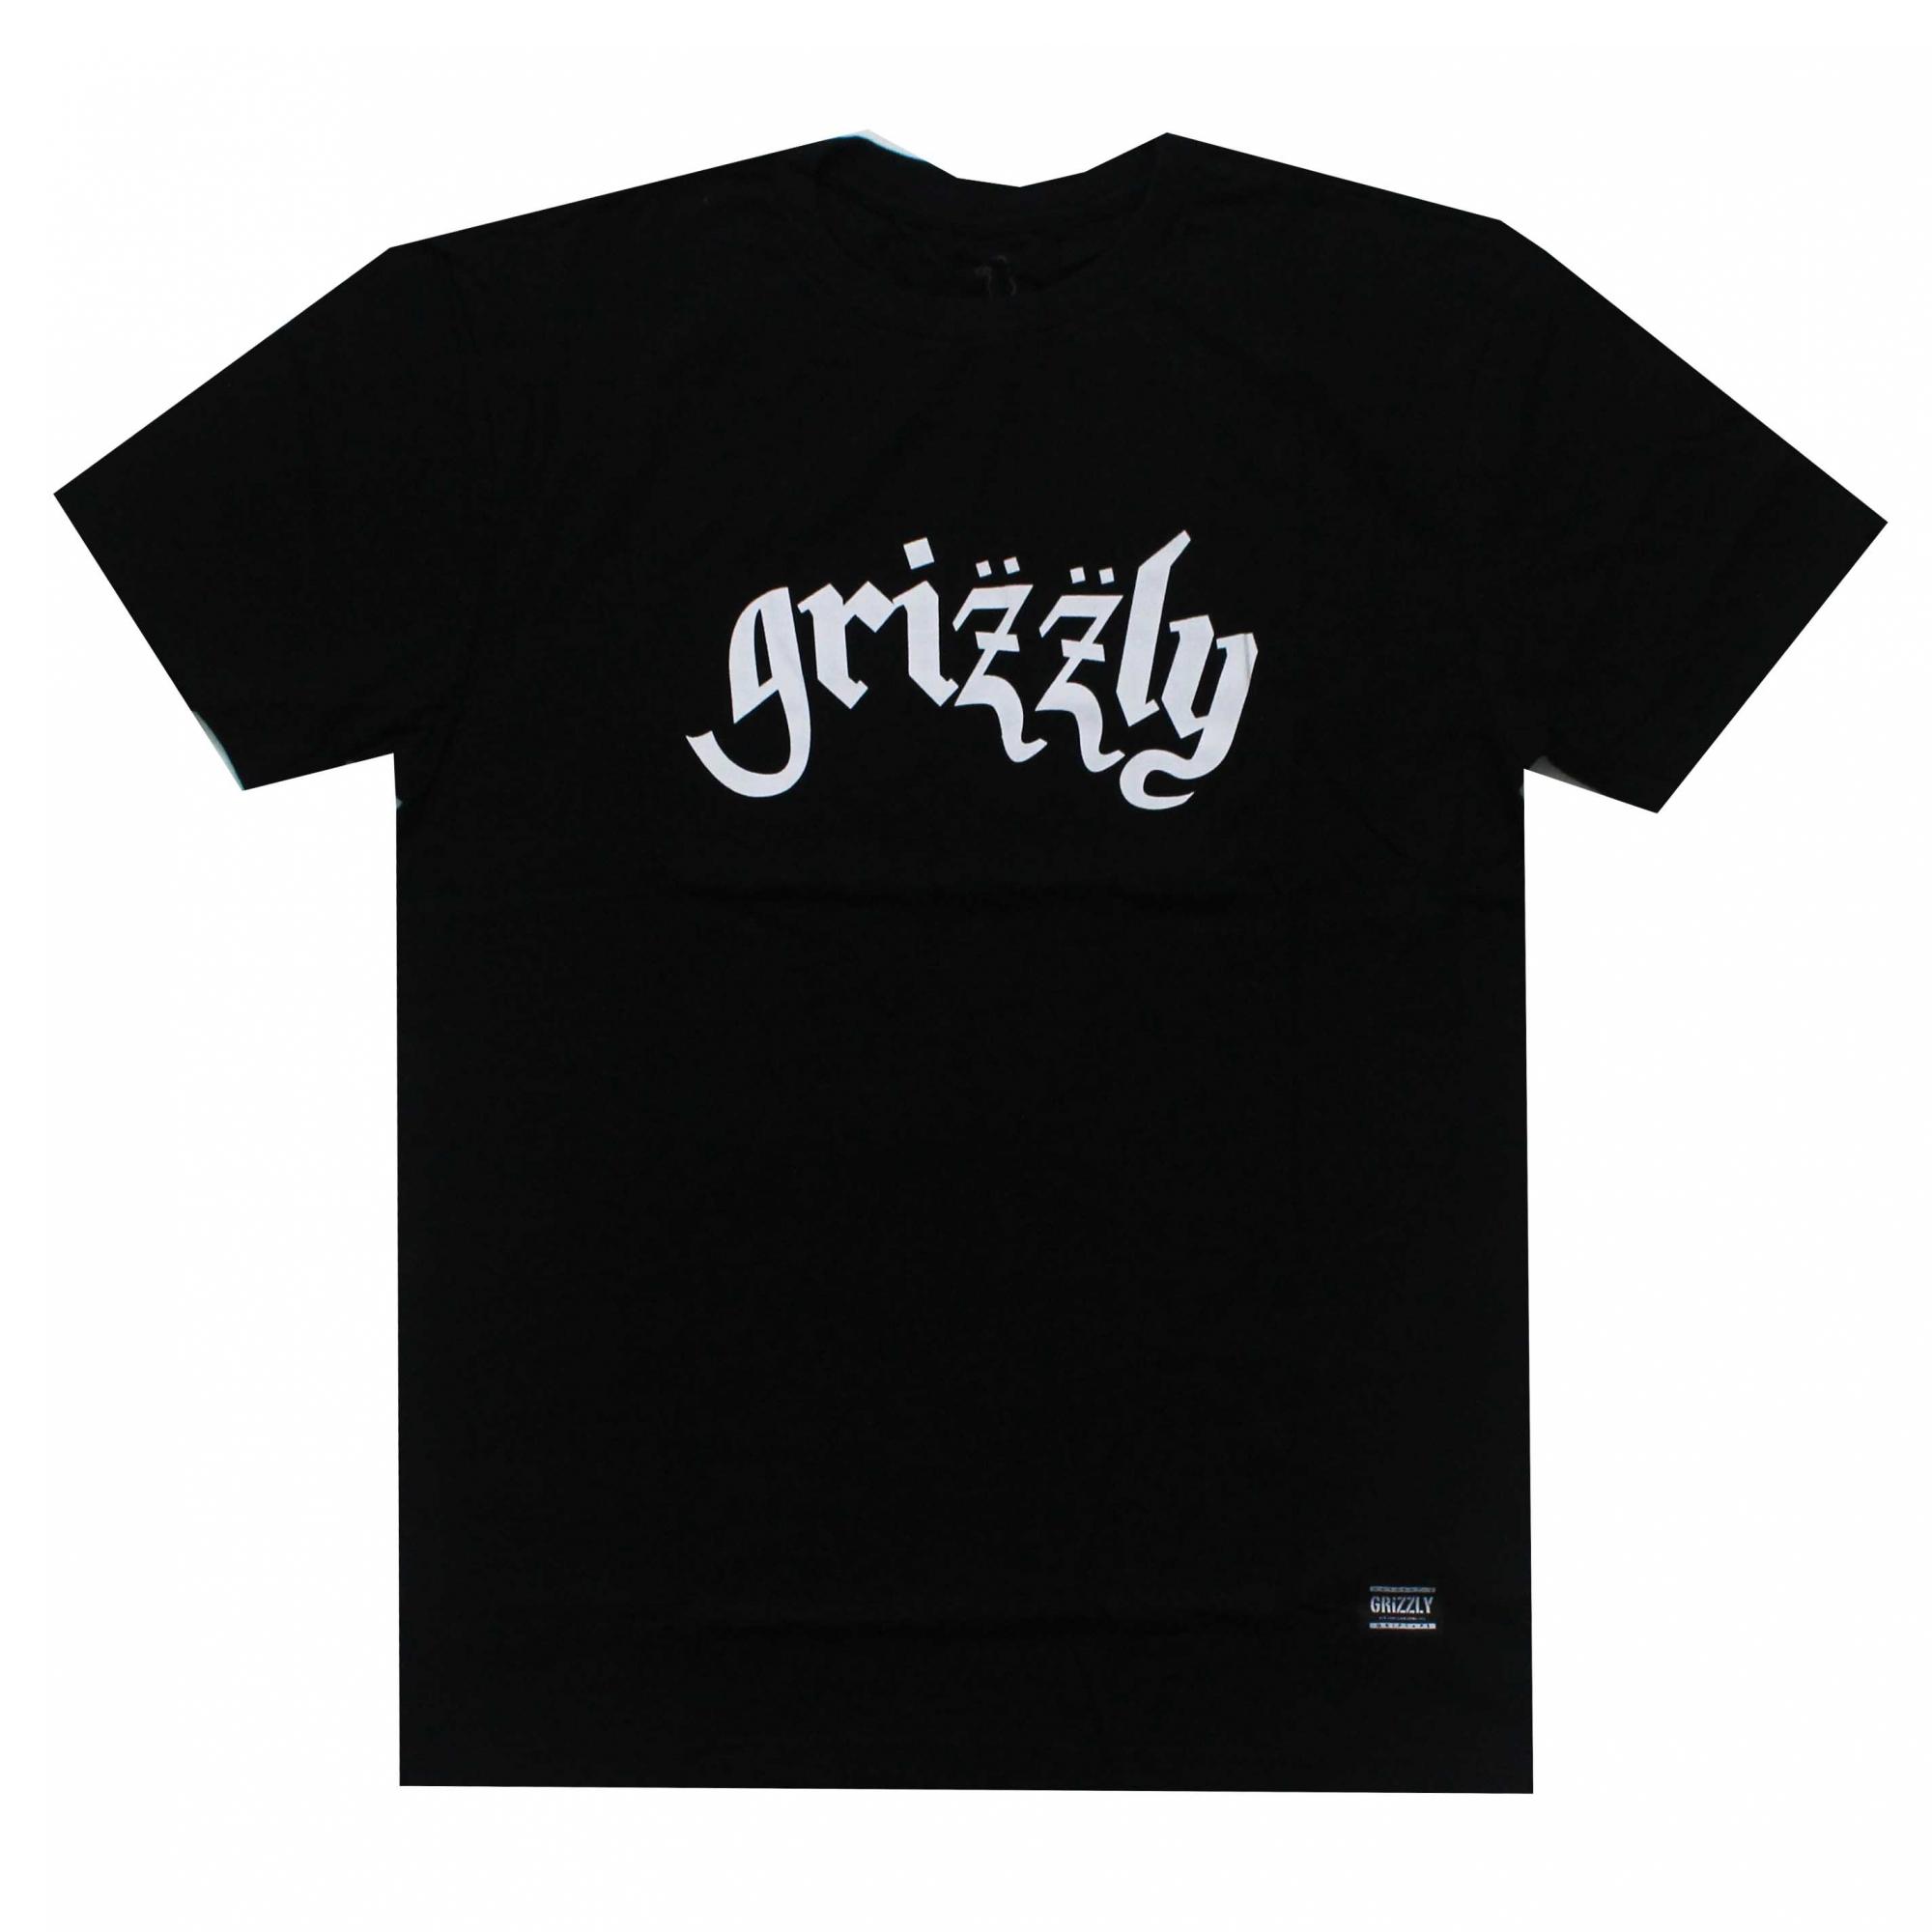 Camiseta Grizzly Motorgrizz - Preto